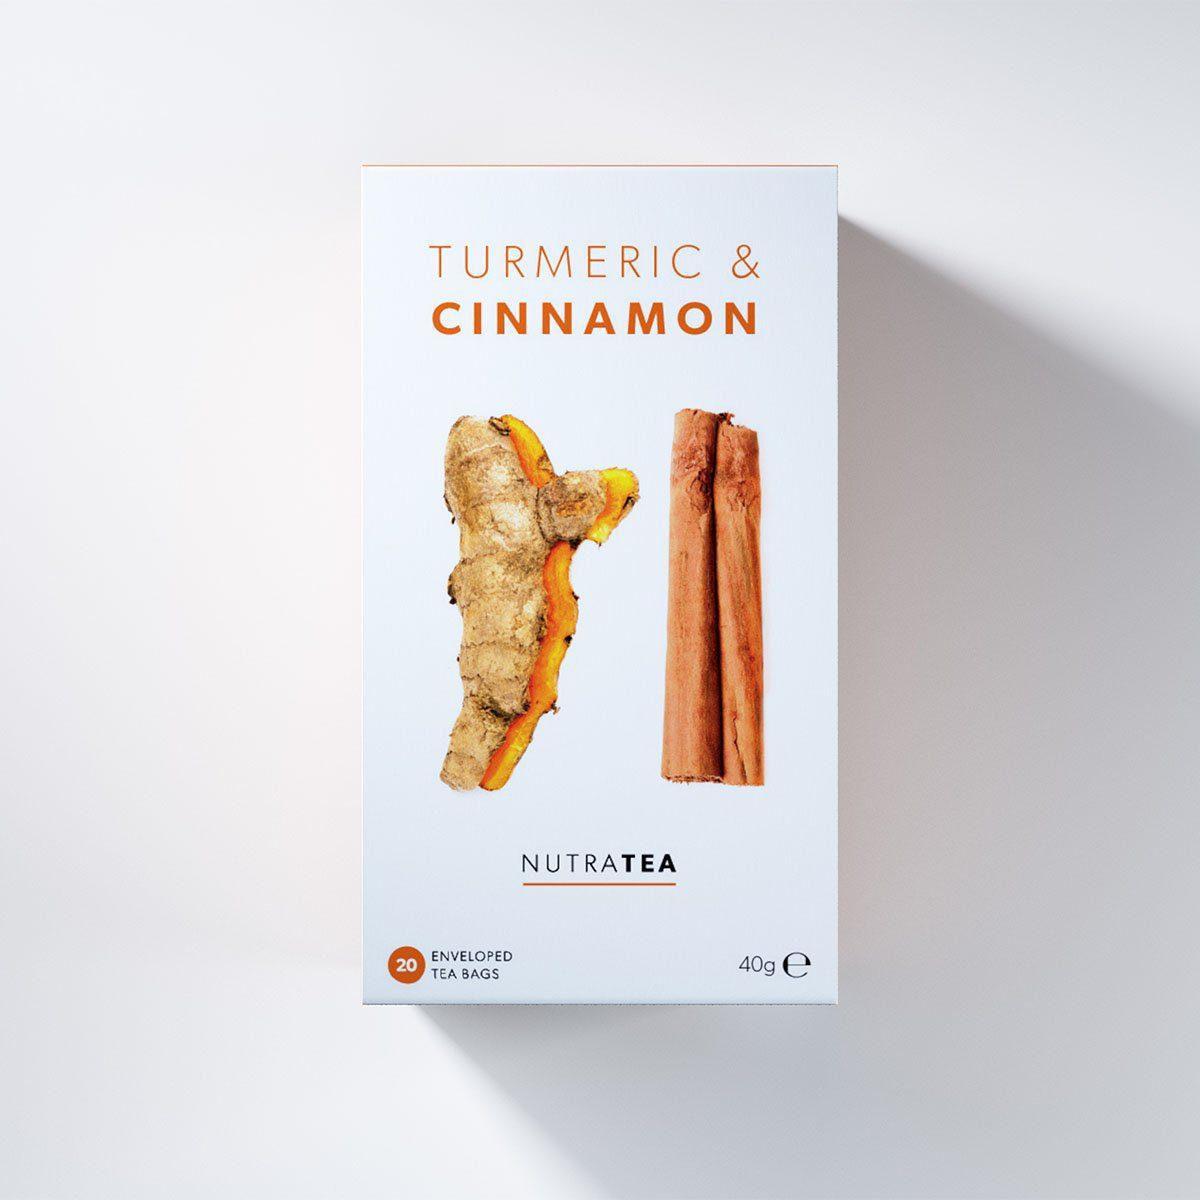 043_Box_NT_Turmeic Cinnamon_Box_Front